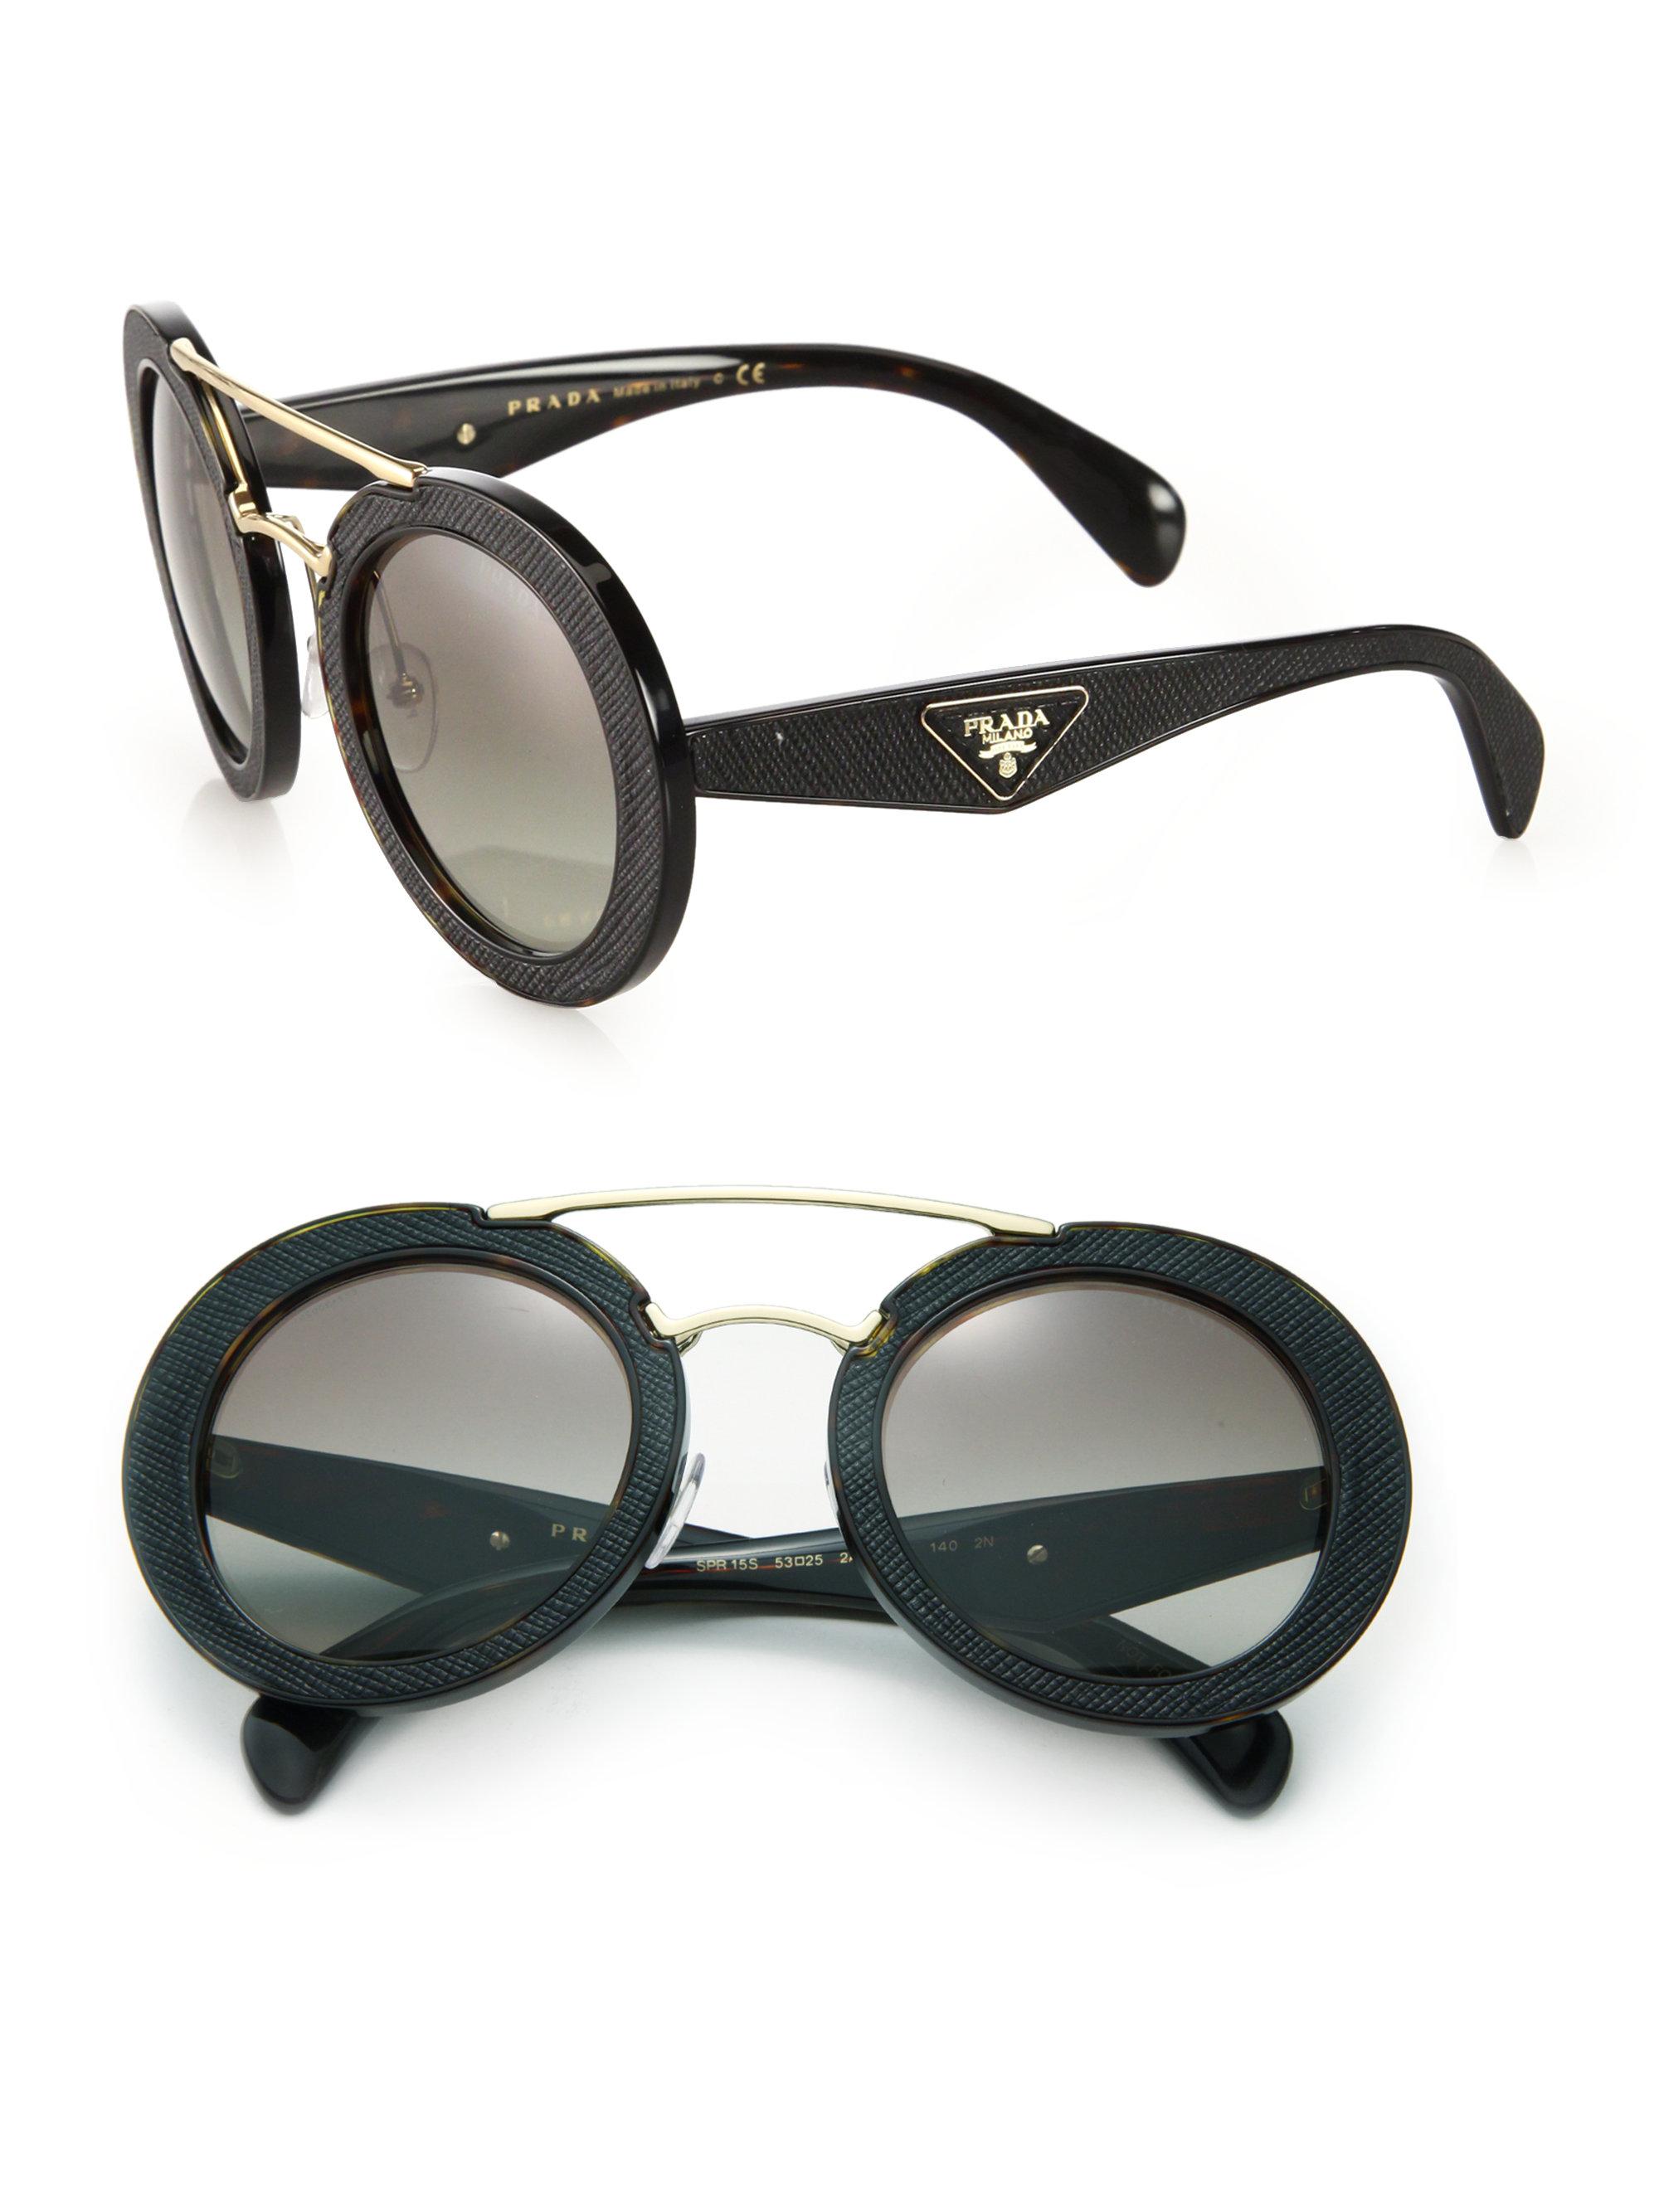 99ac2a9dec Prada Ornate 15ss 53mm Saffiano Leather Round Sunglasses in Black